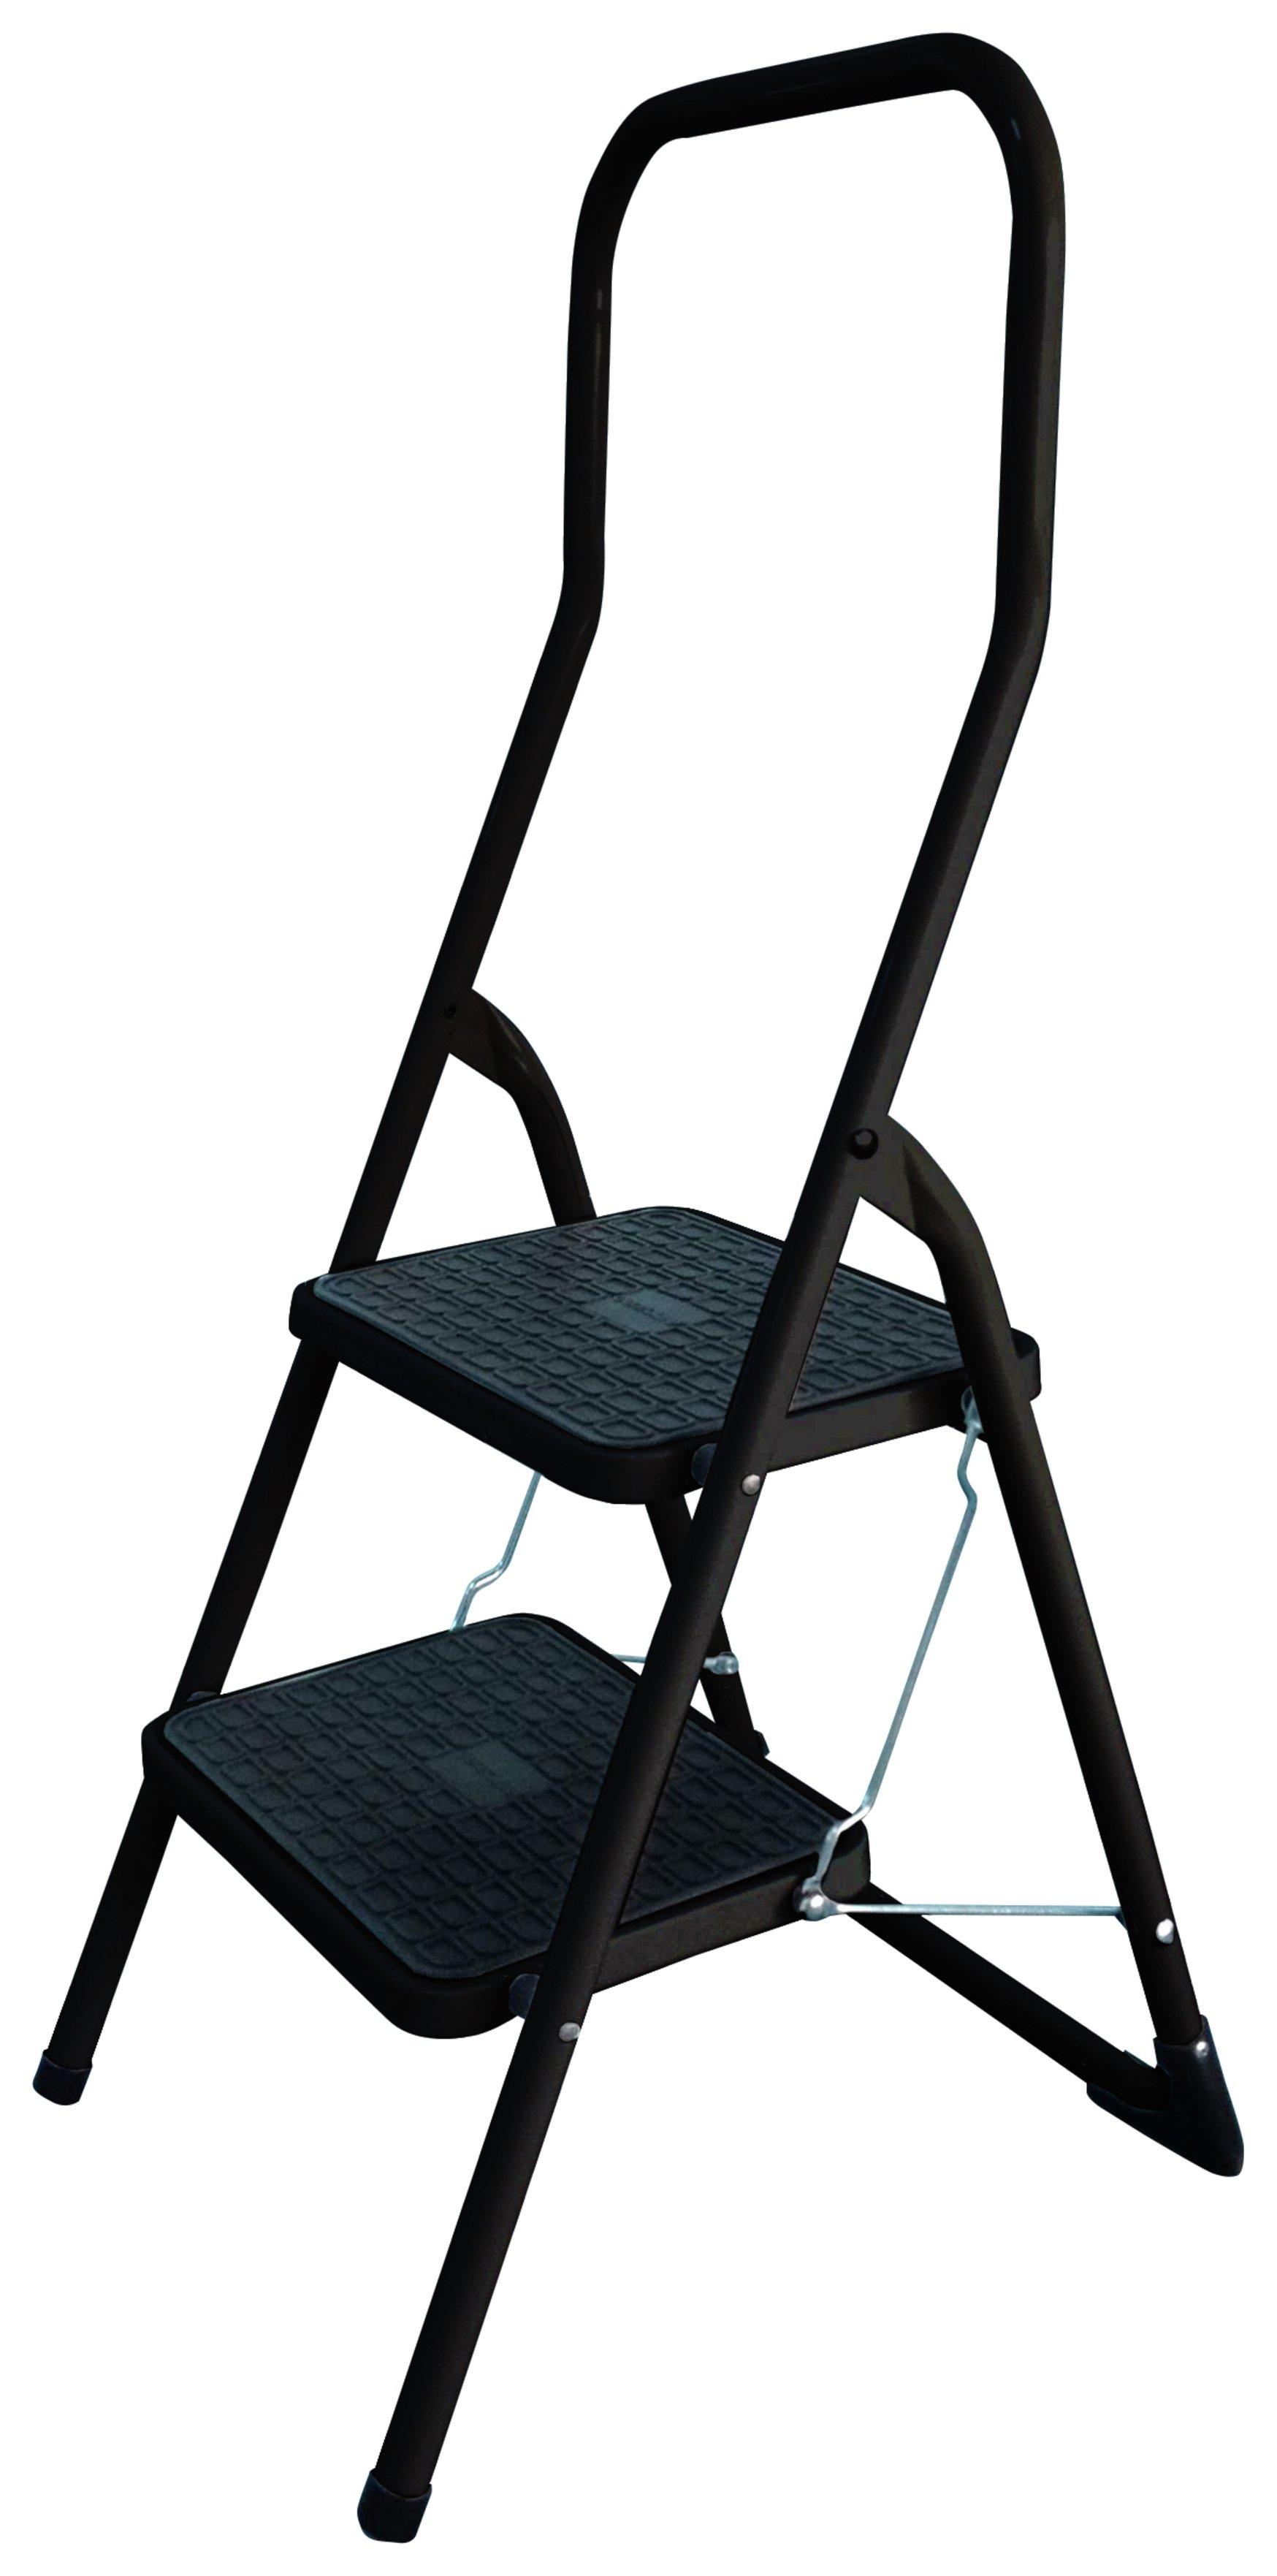 Abru 2 Step Stepstool with High Handrail